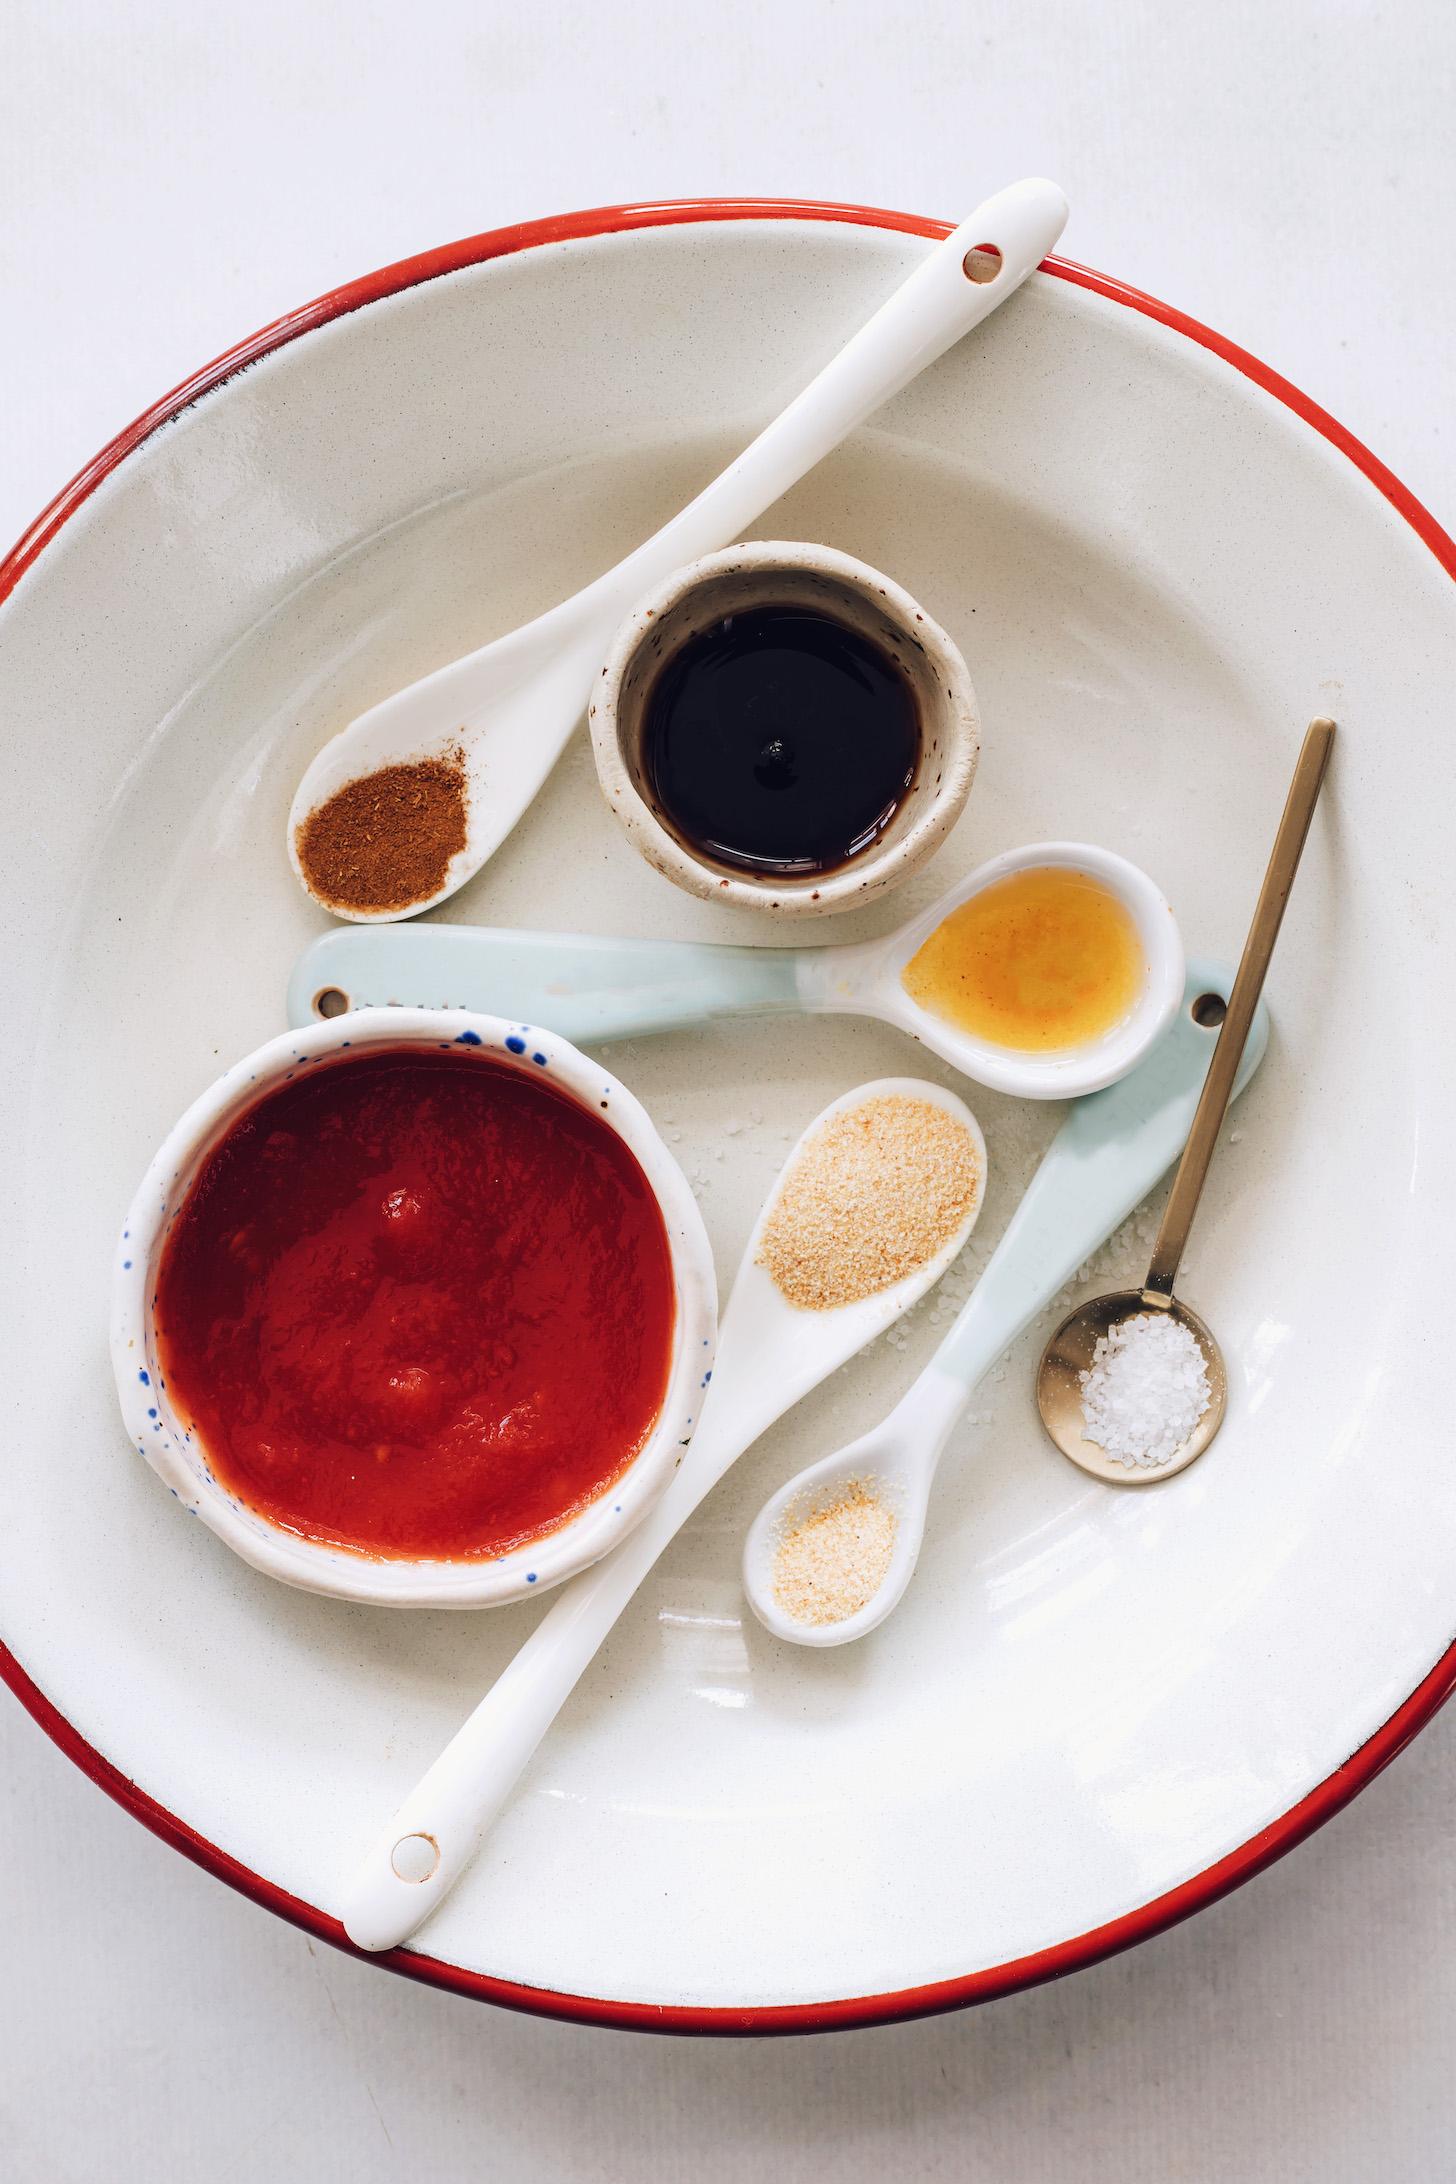 Tomato purée, garlic powder, onion powder, salt, vinegar, maple syrup, and allspice